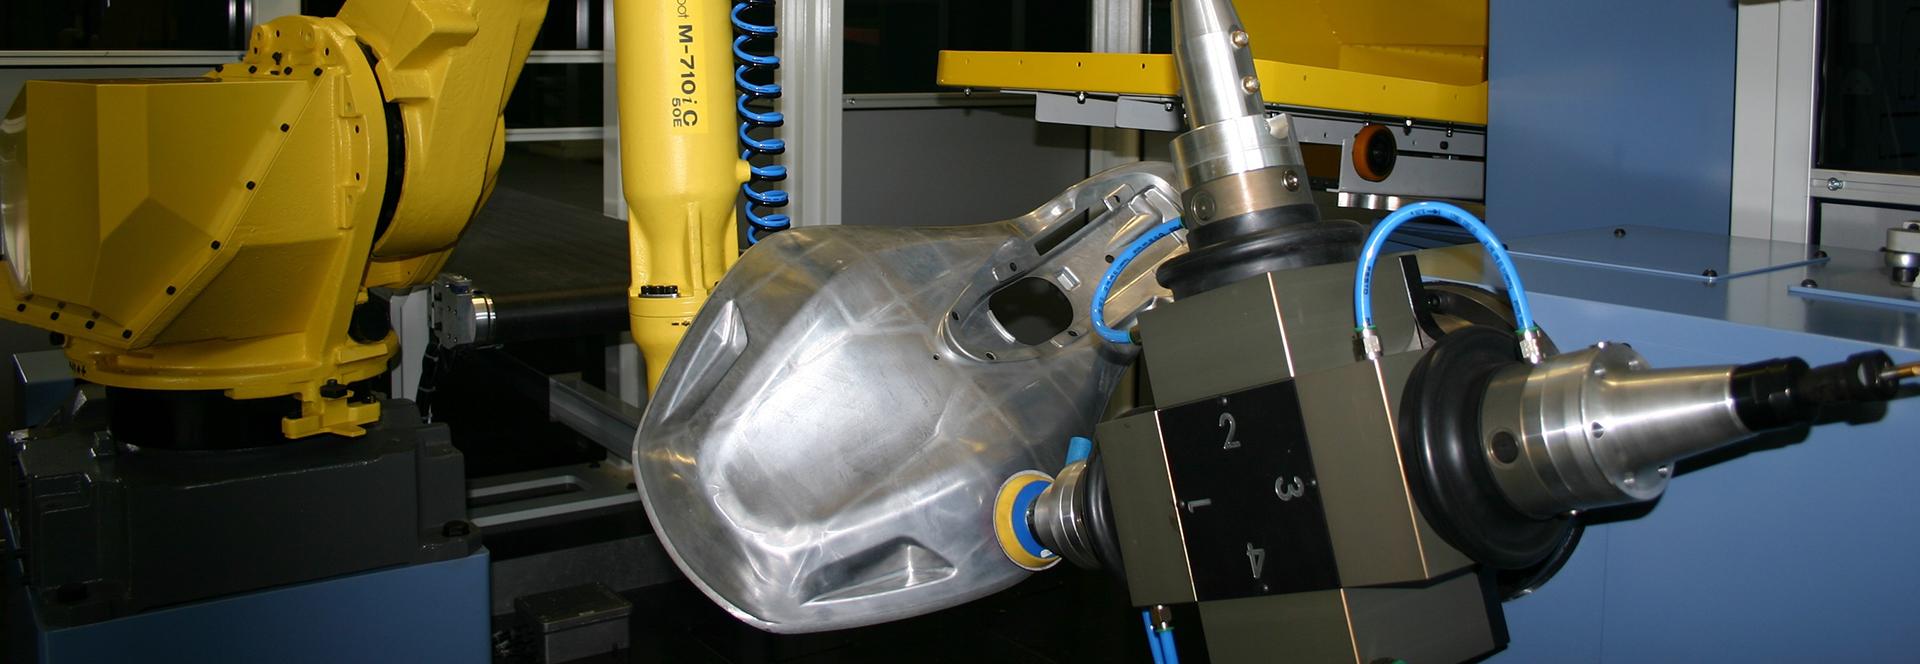 BMT Pulitura Metalli - Lucidatura Metalli